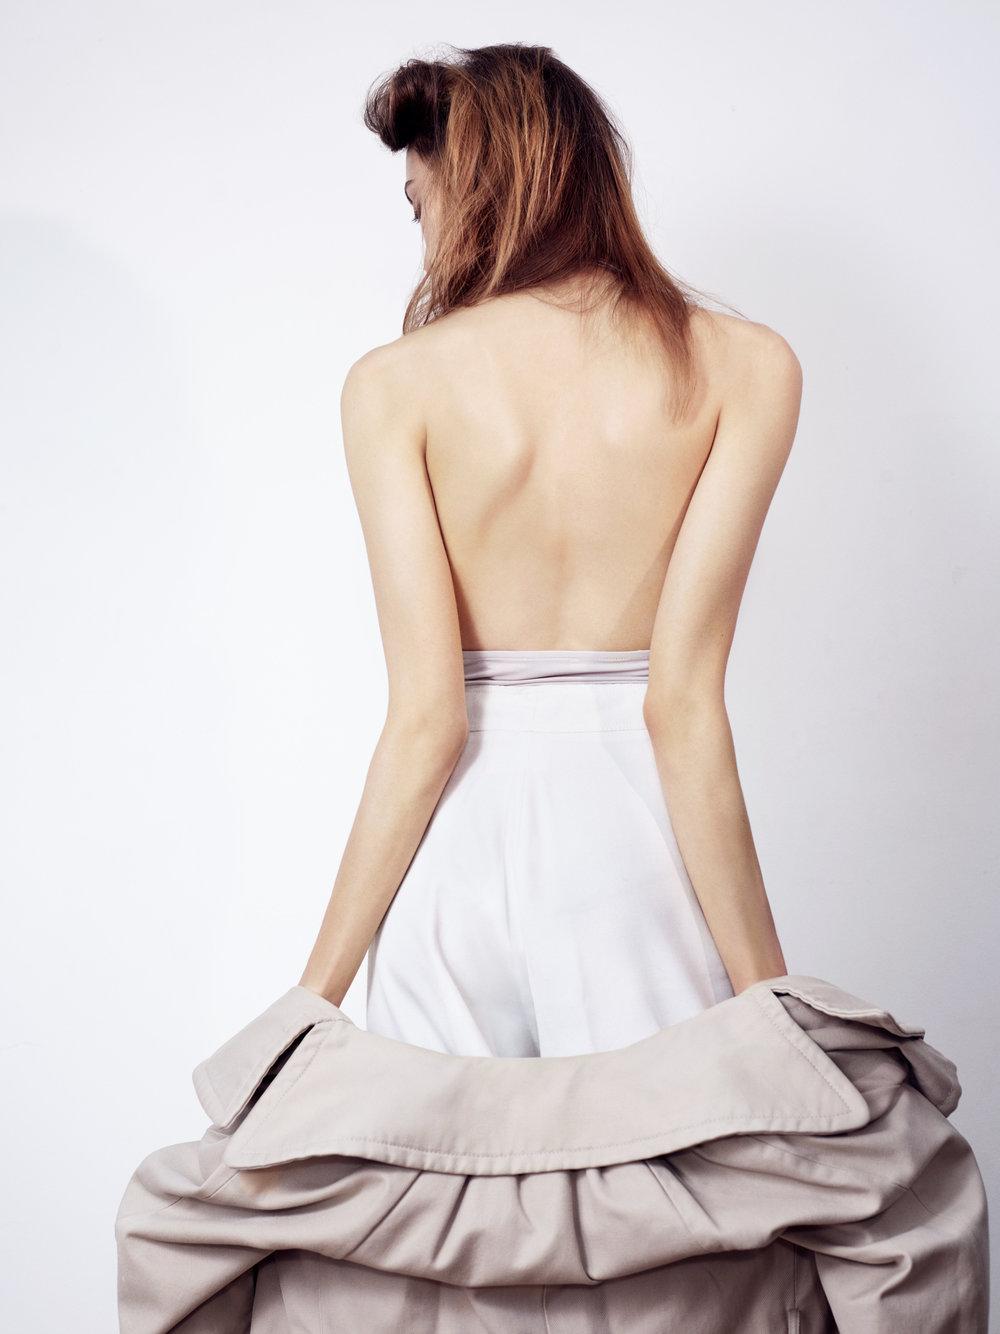 Jack_Eames_Fashion_Shot_07.jpg